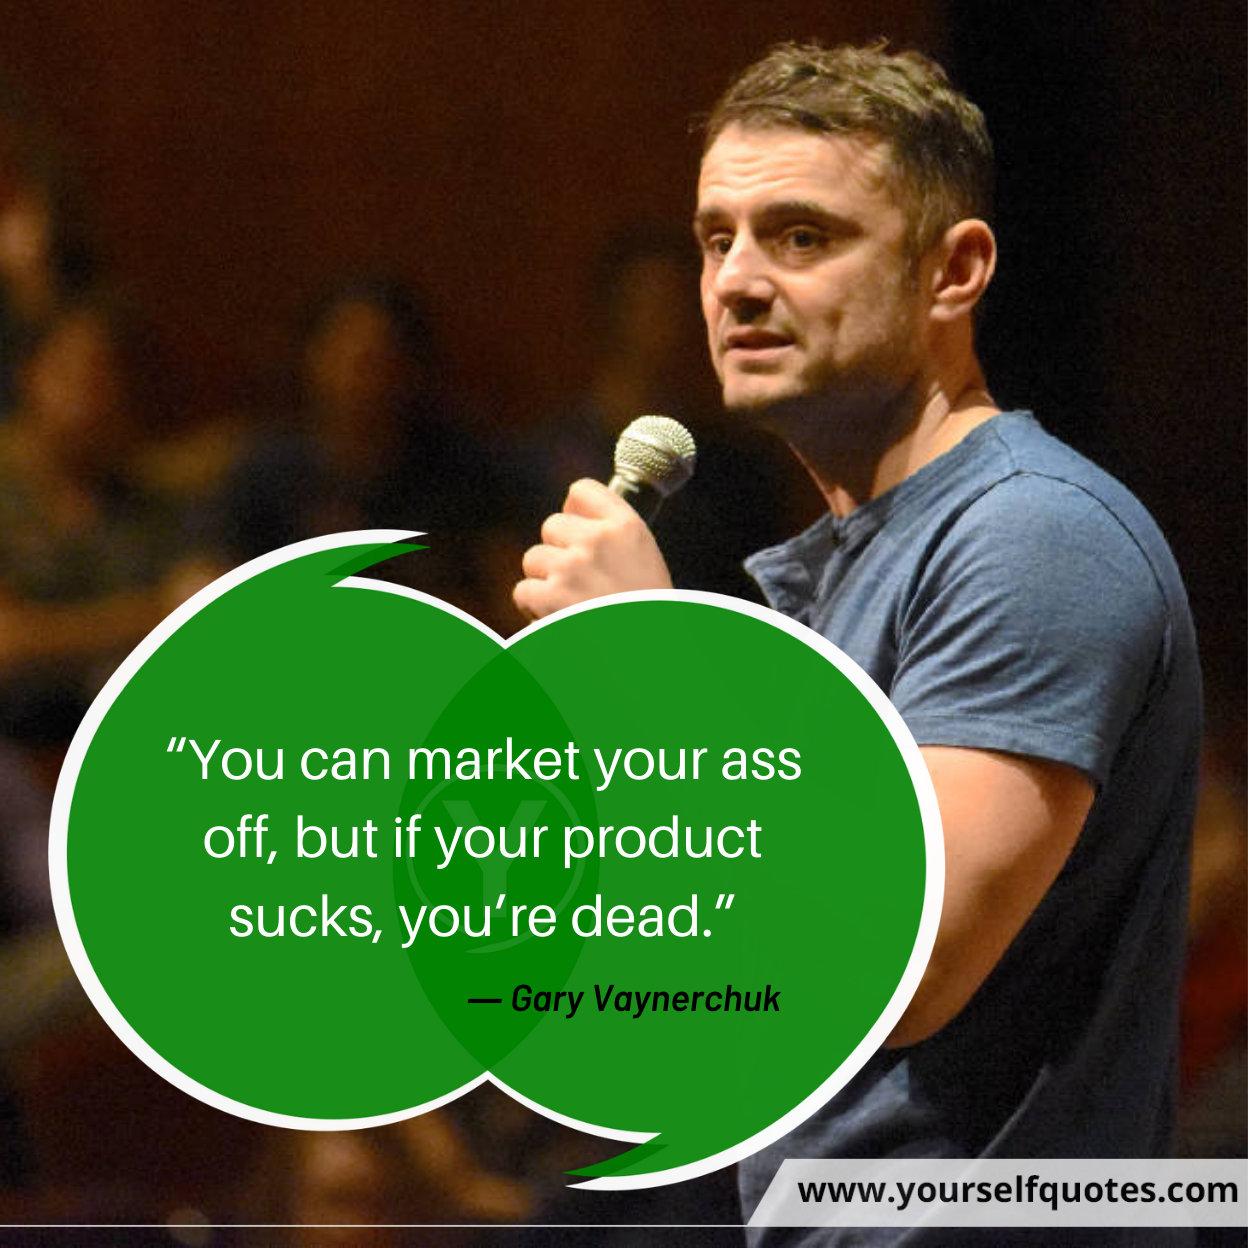 Quote by Gary Vaynerchuk